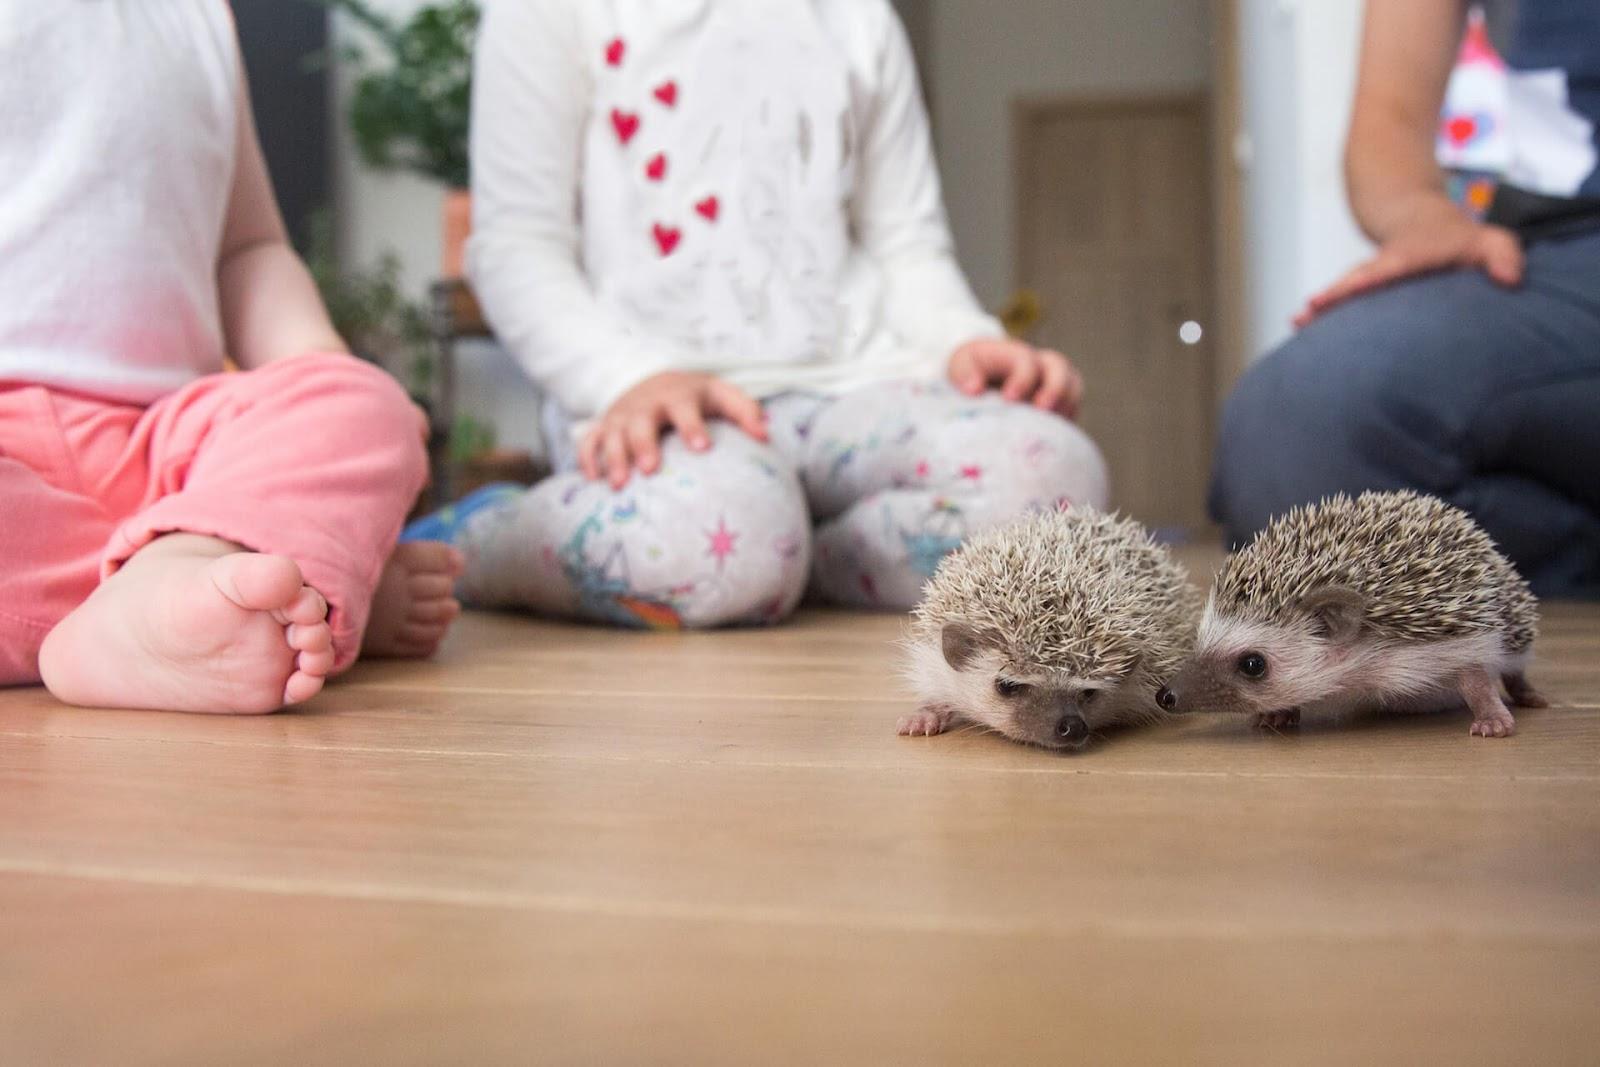 Children watching two pet hedgehogs crawl around the floor